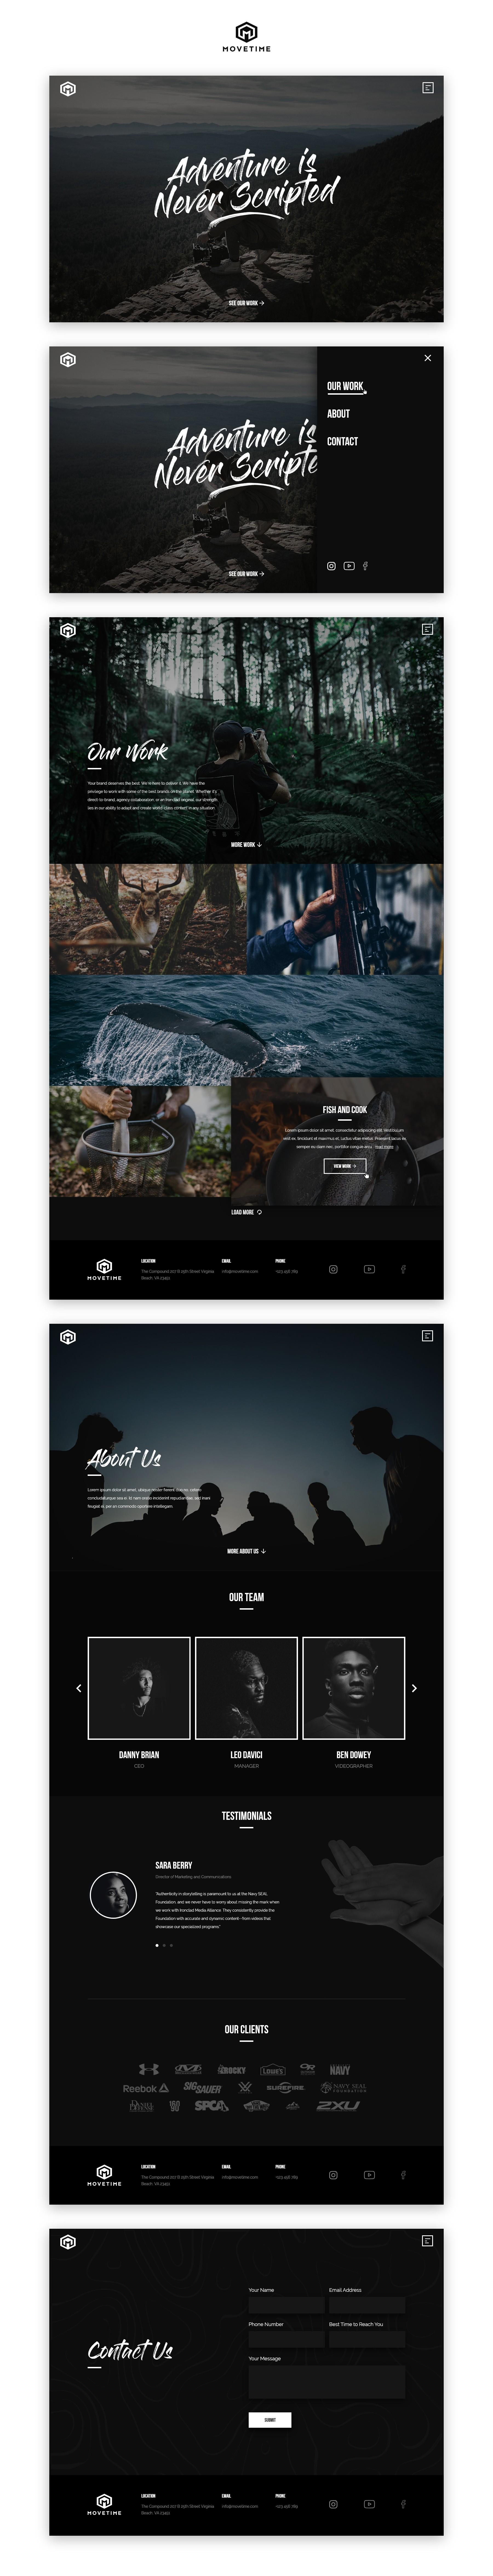 Video Production Company Website // Simplistic Design